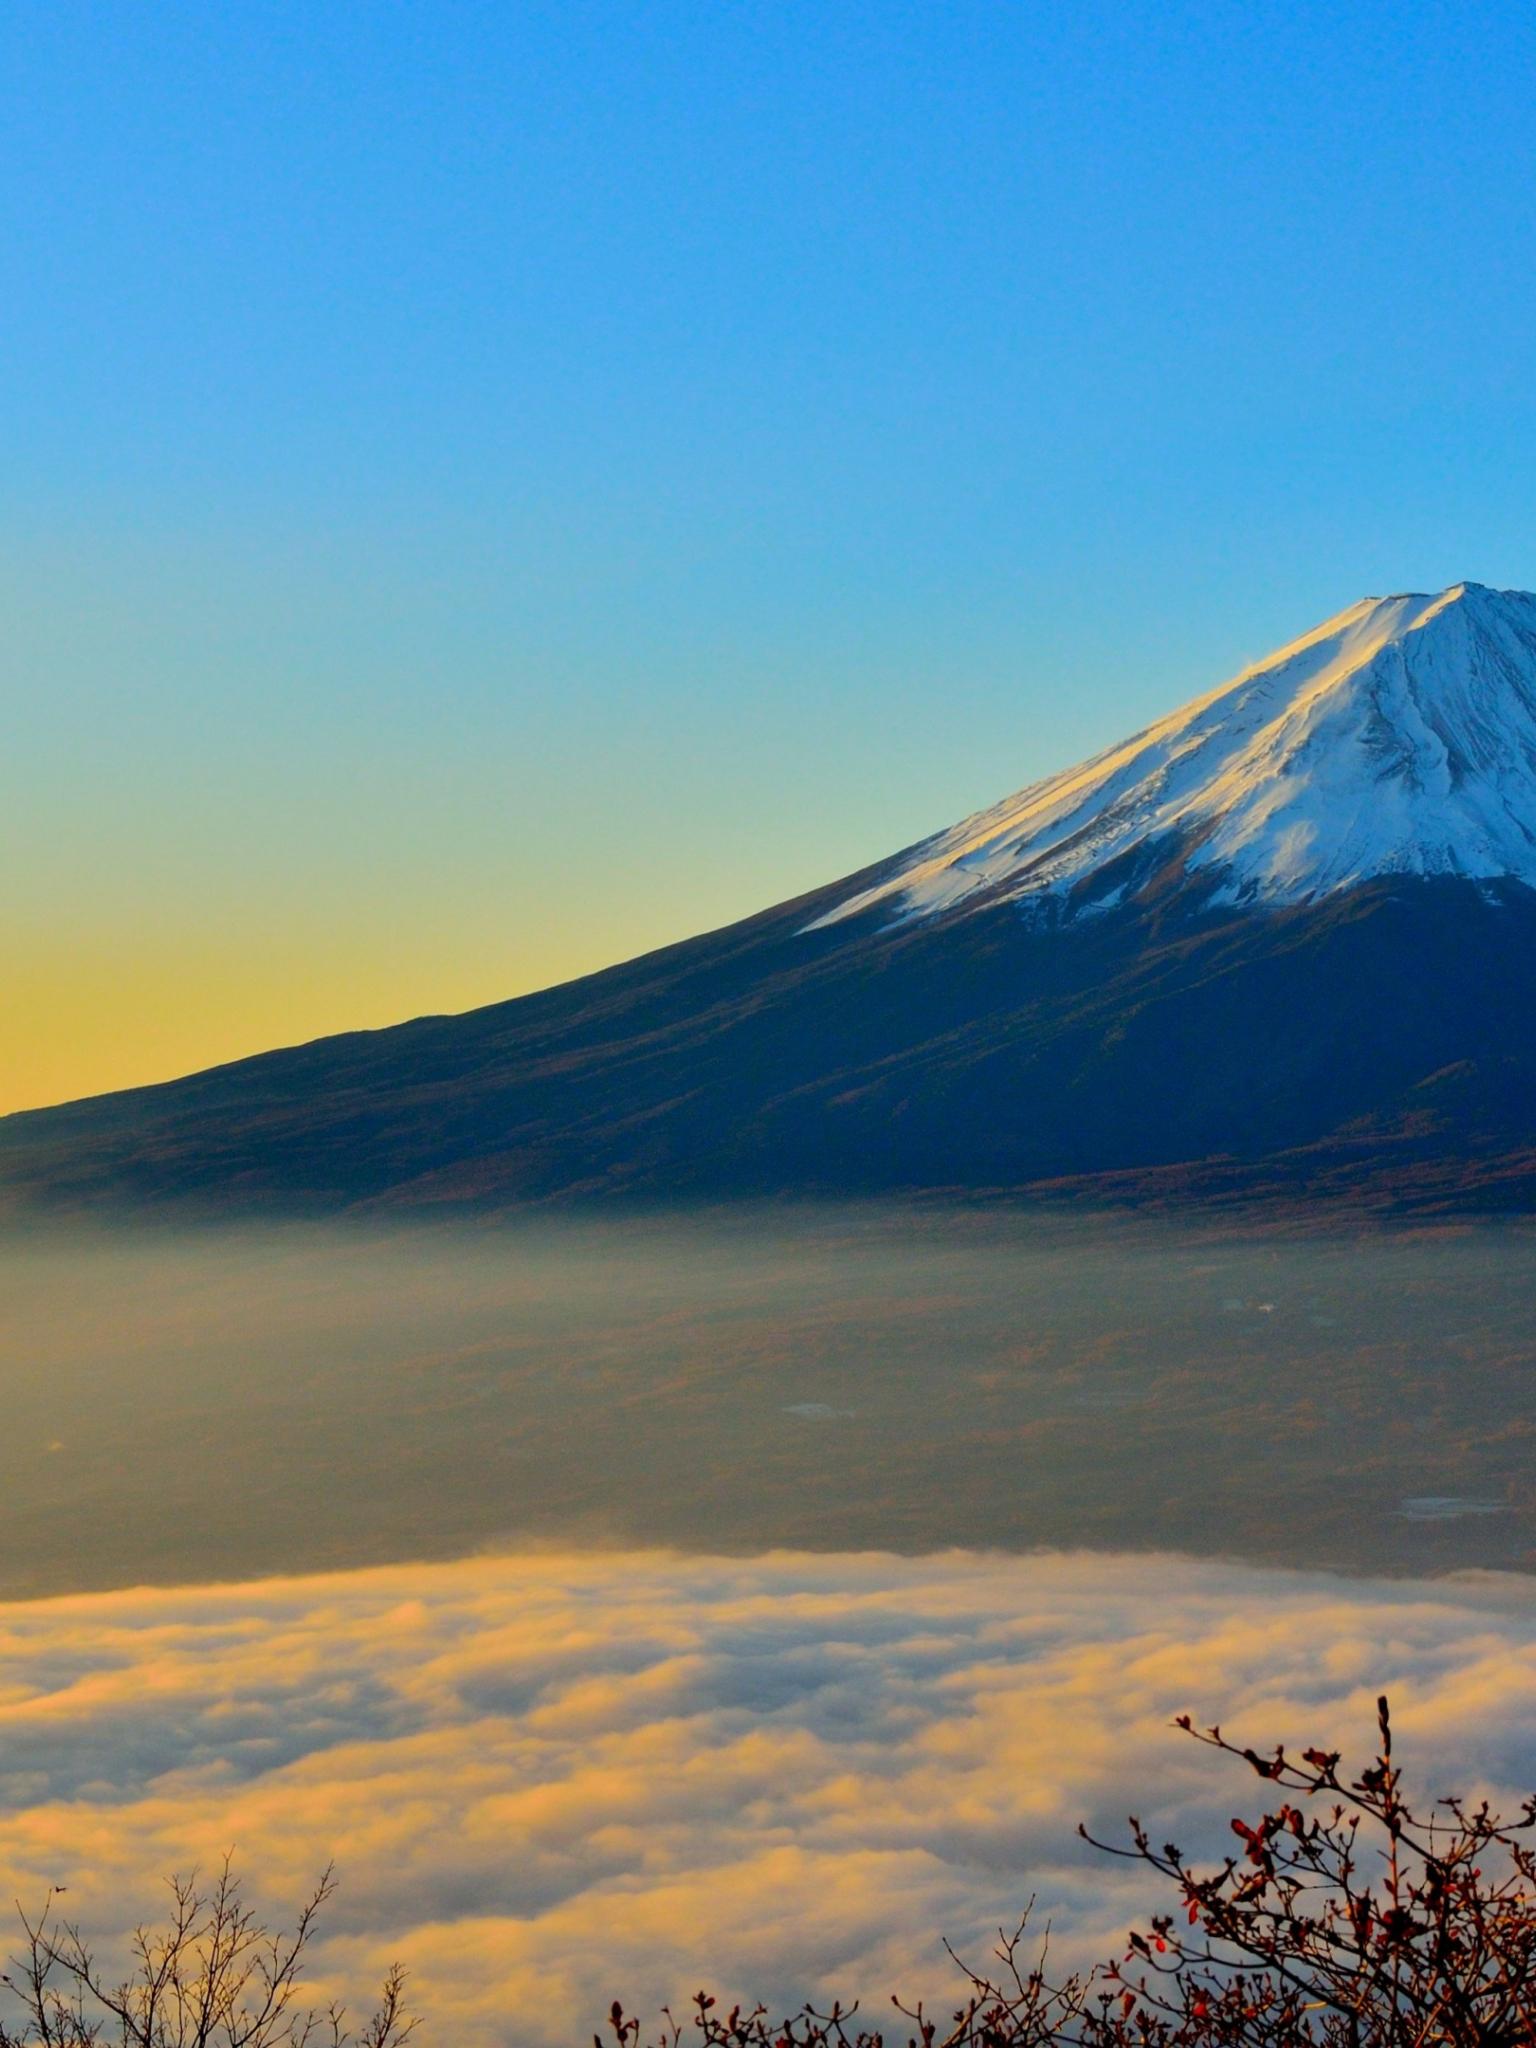 Free Download 4k Mount Fuji Wallpaper Id 128 3840x2160 For